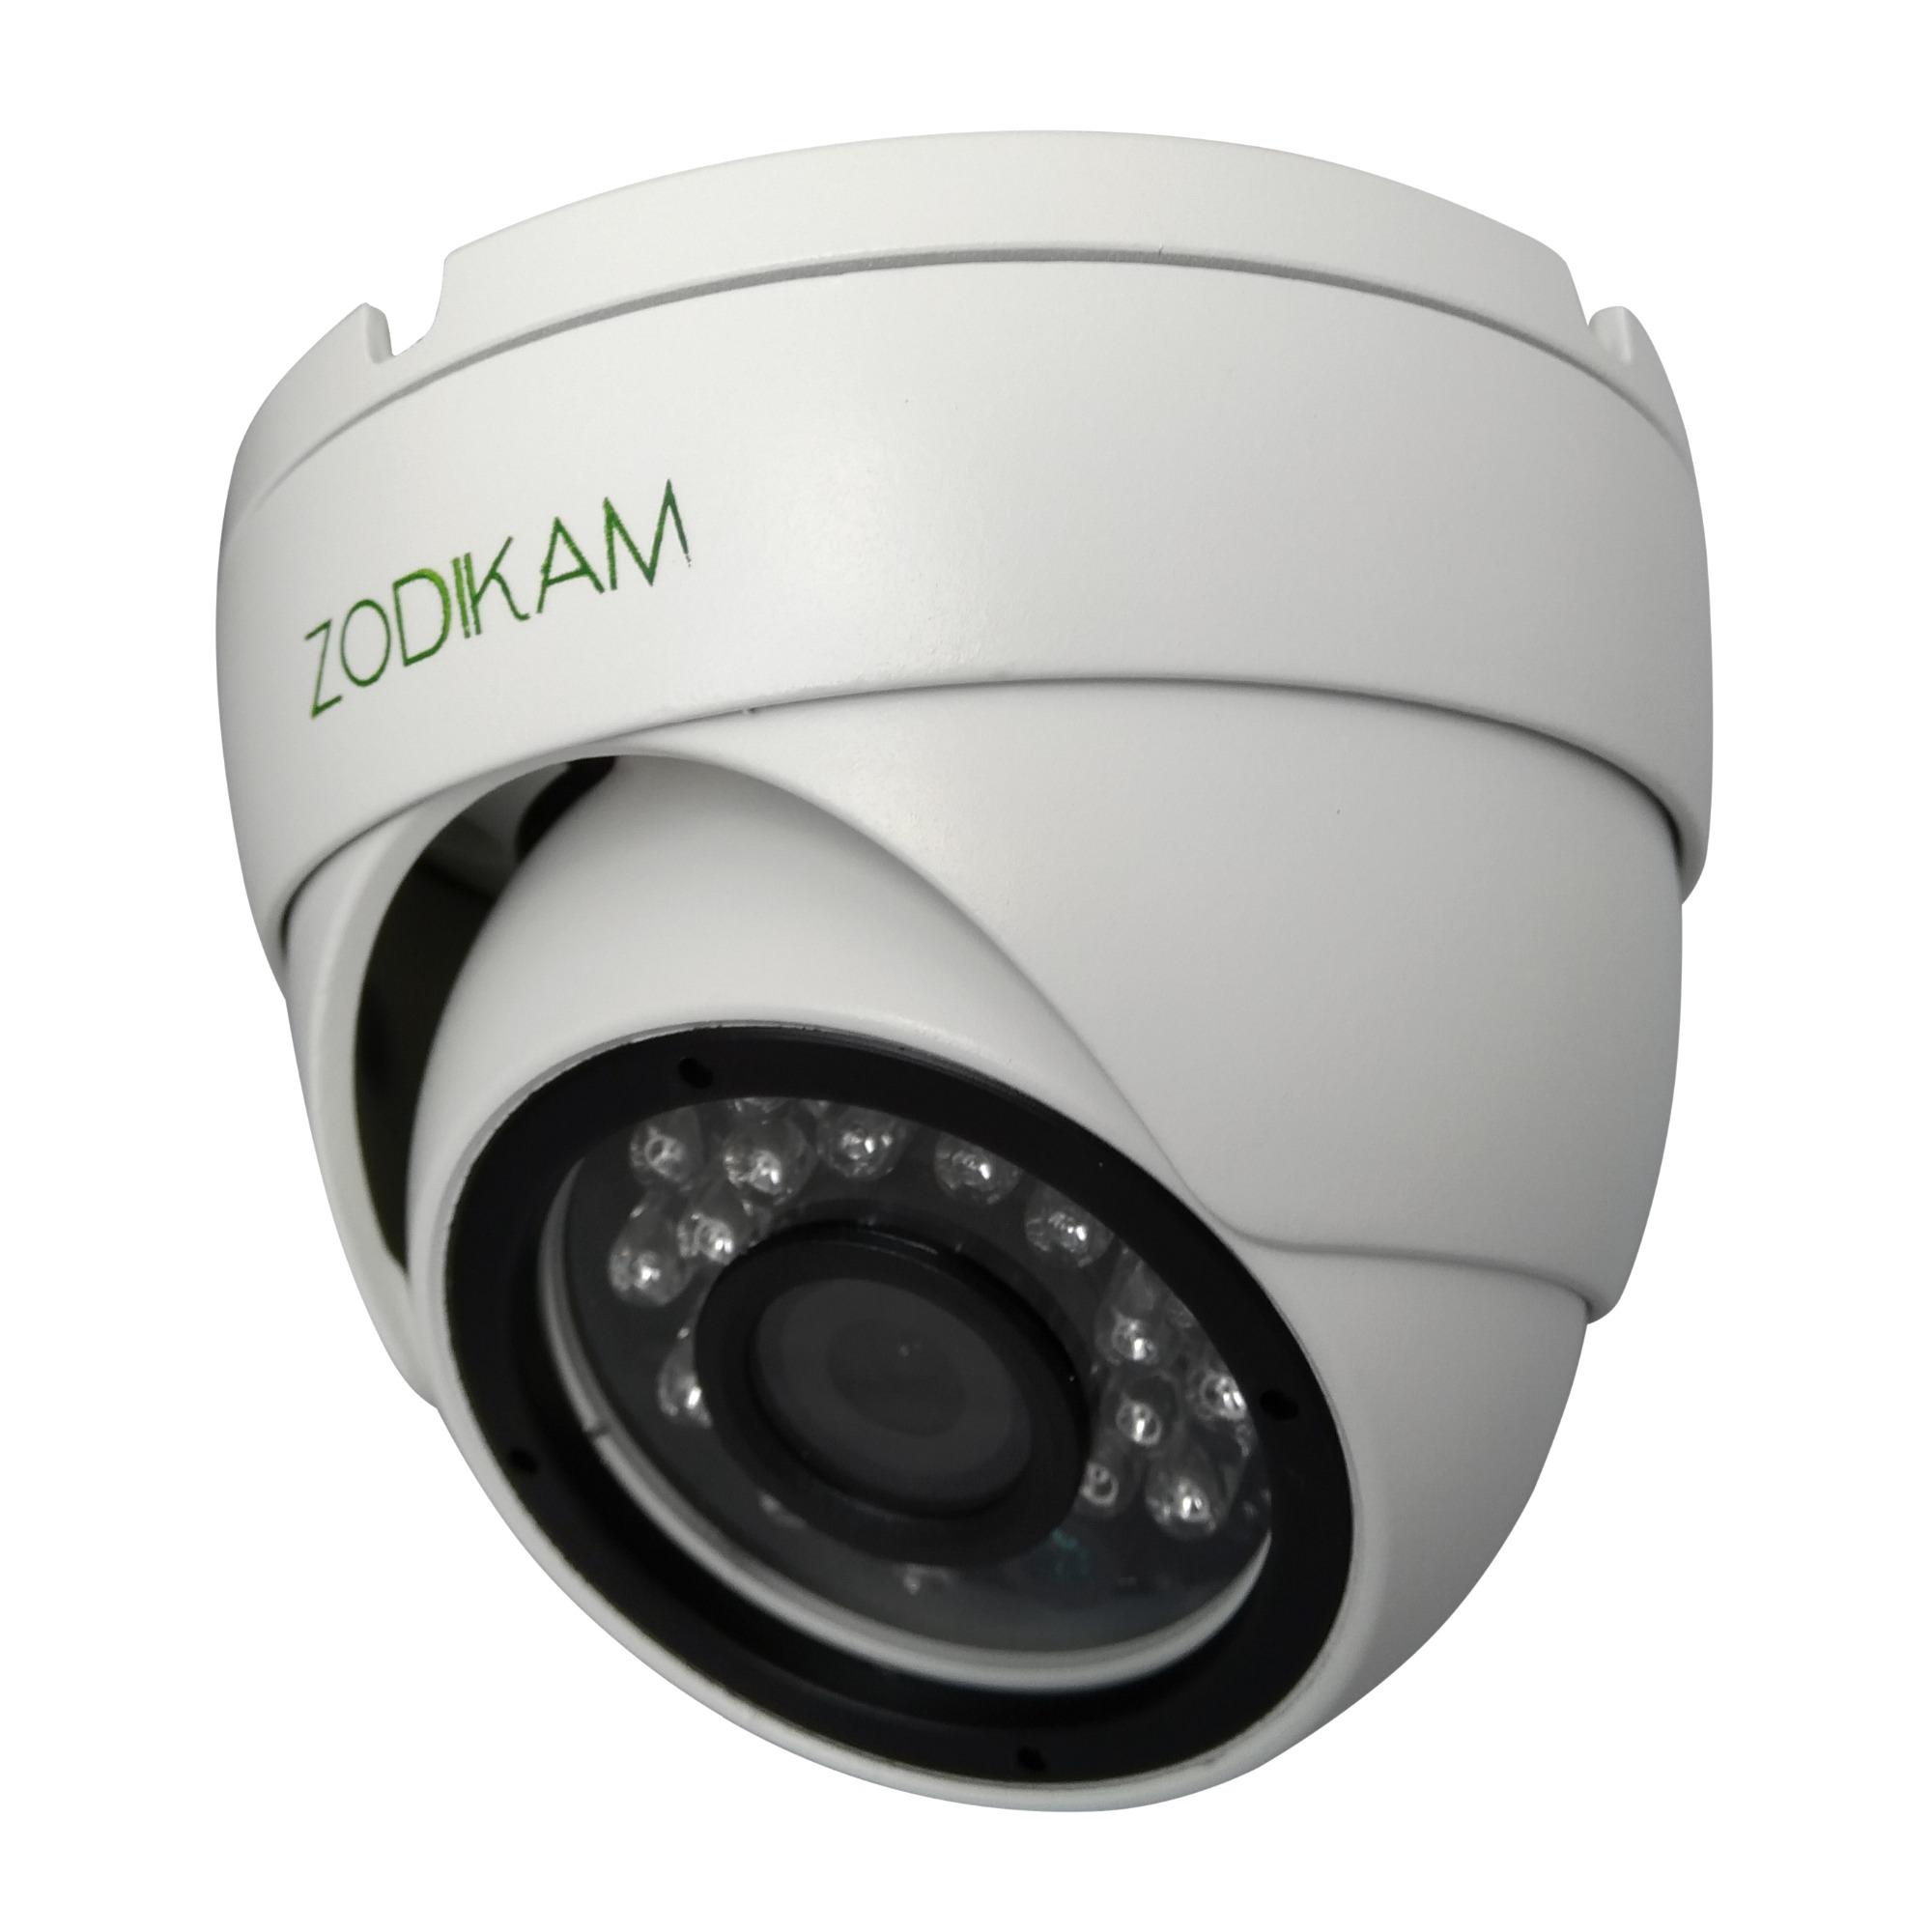 Камера видеонаблюдения Zodikam 3242-PM, белый